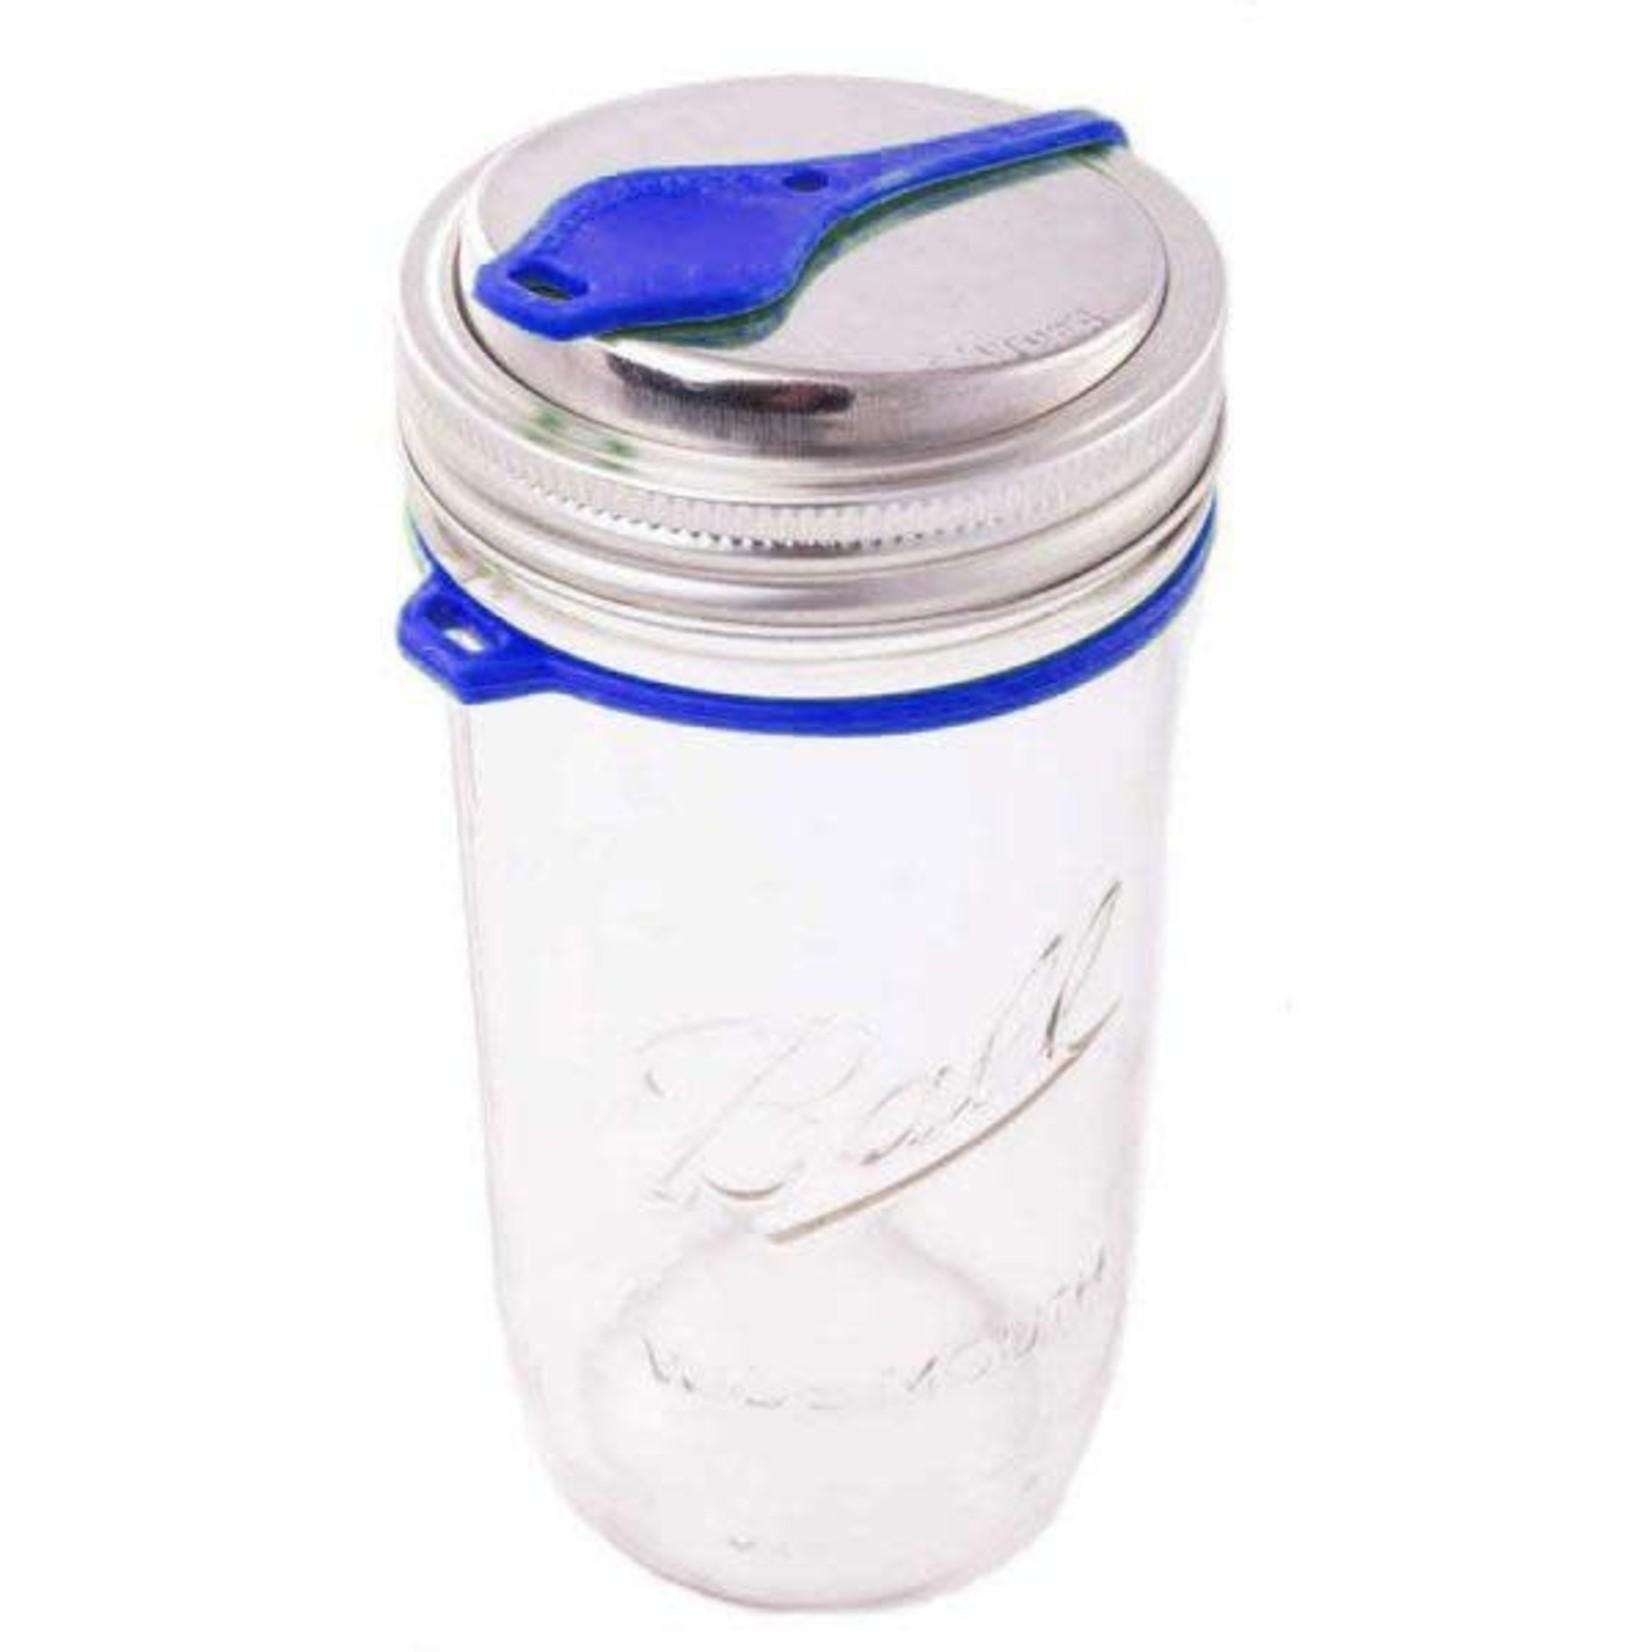 Eco Jarz EcoJarz Glass Bubble Tea Cup Pop Top Kit